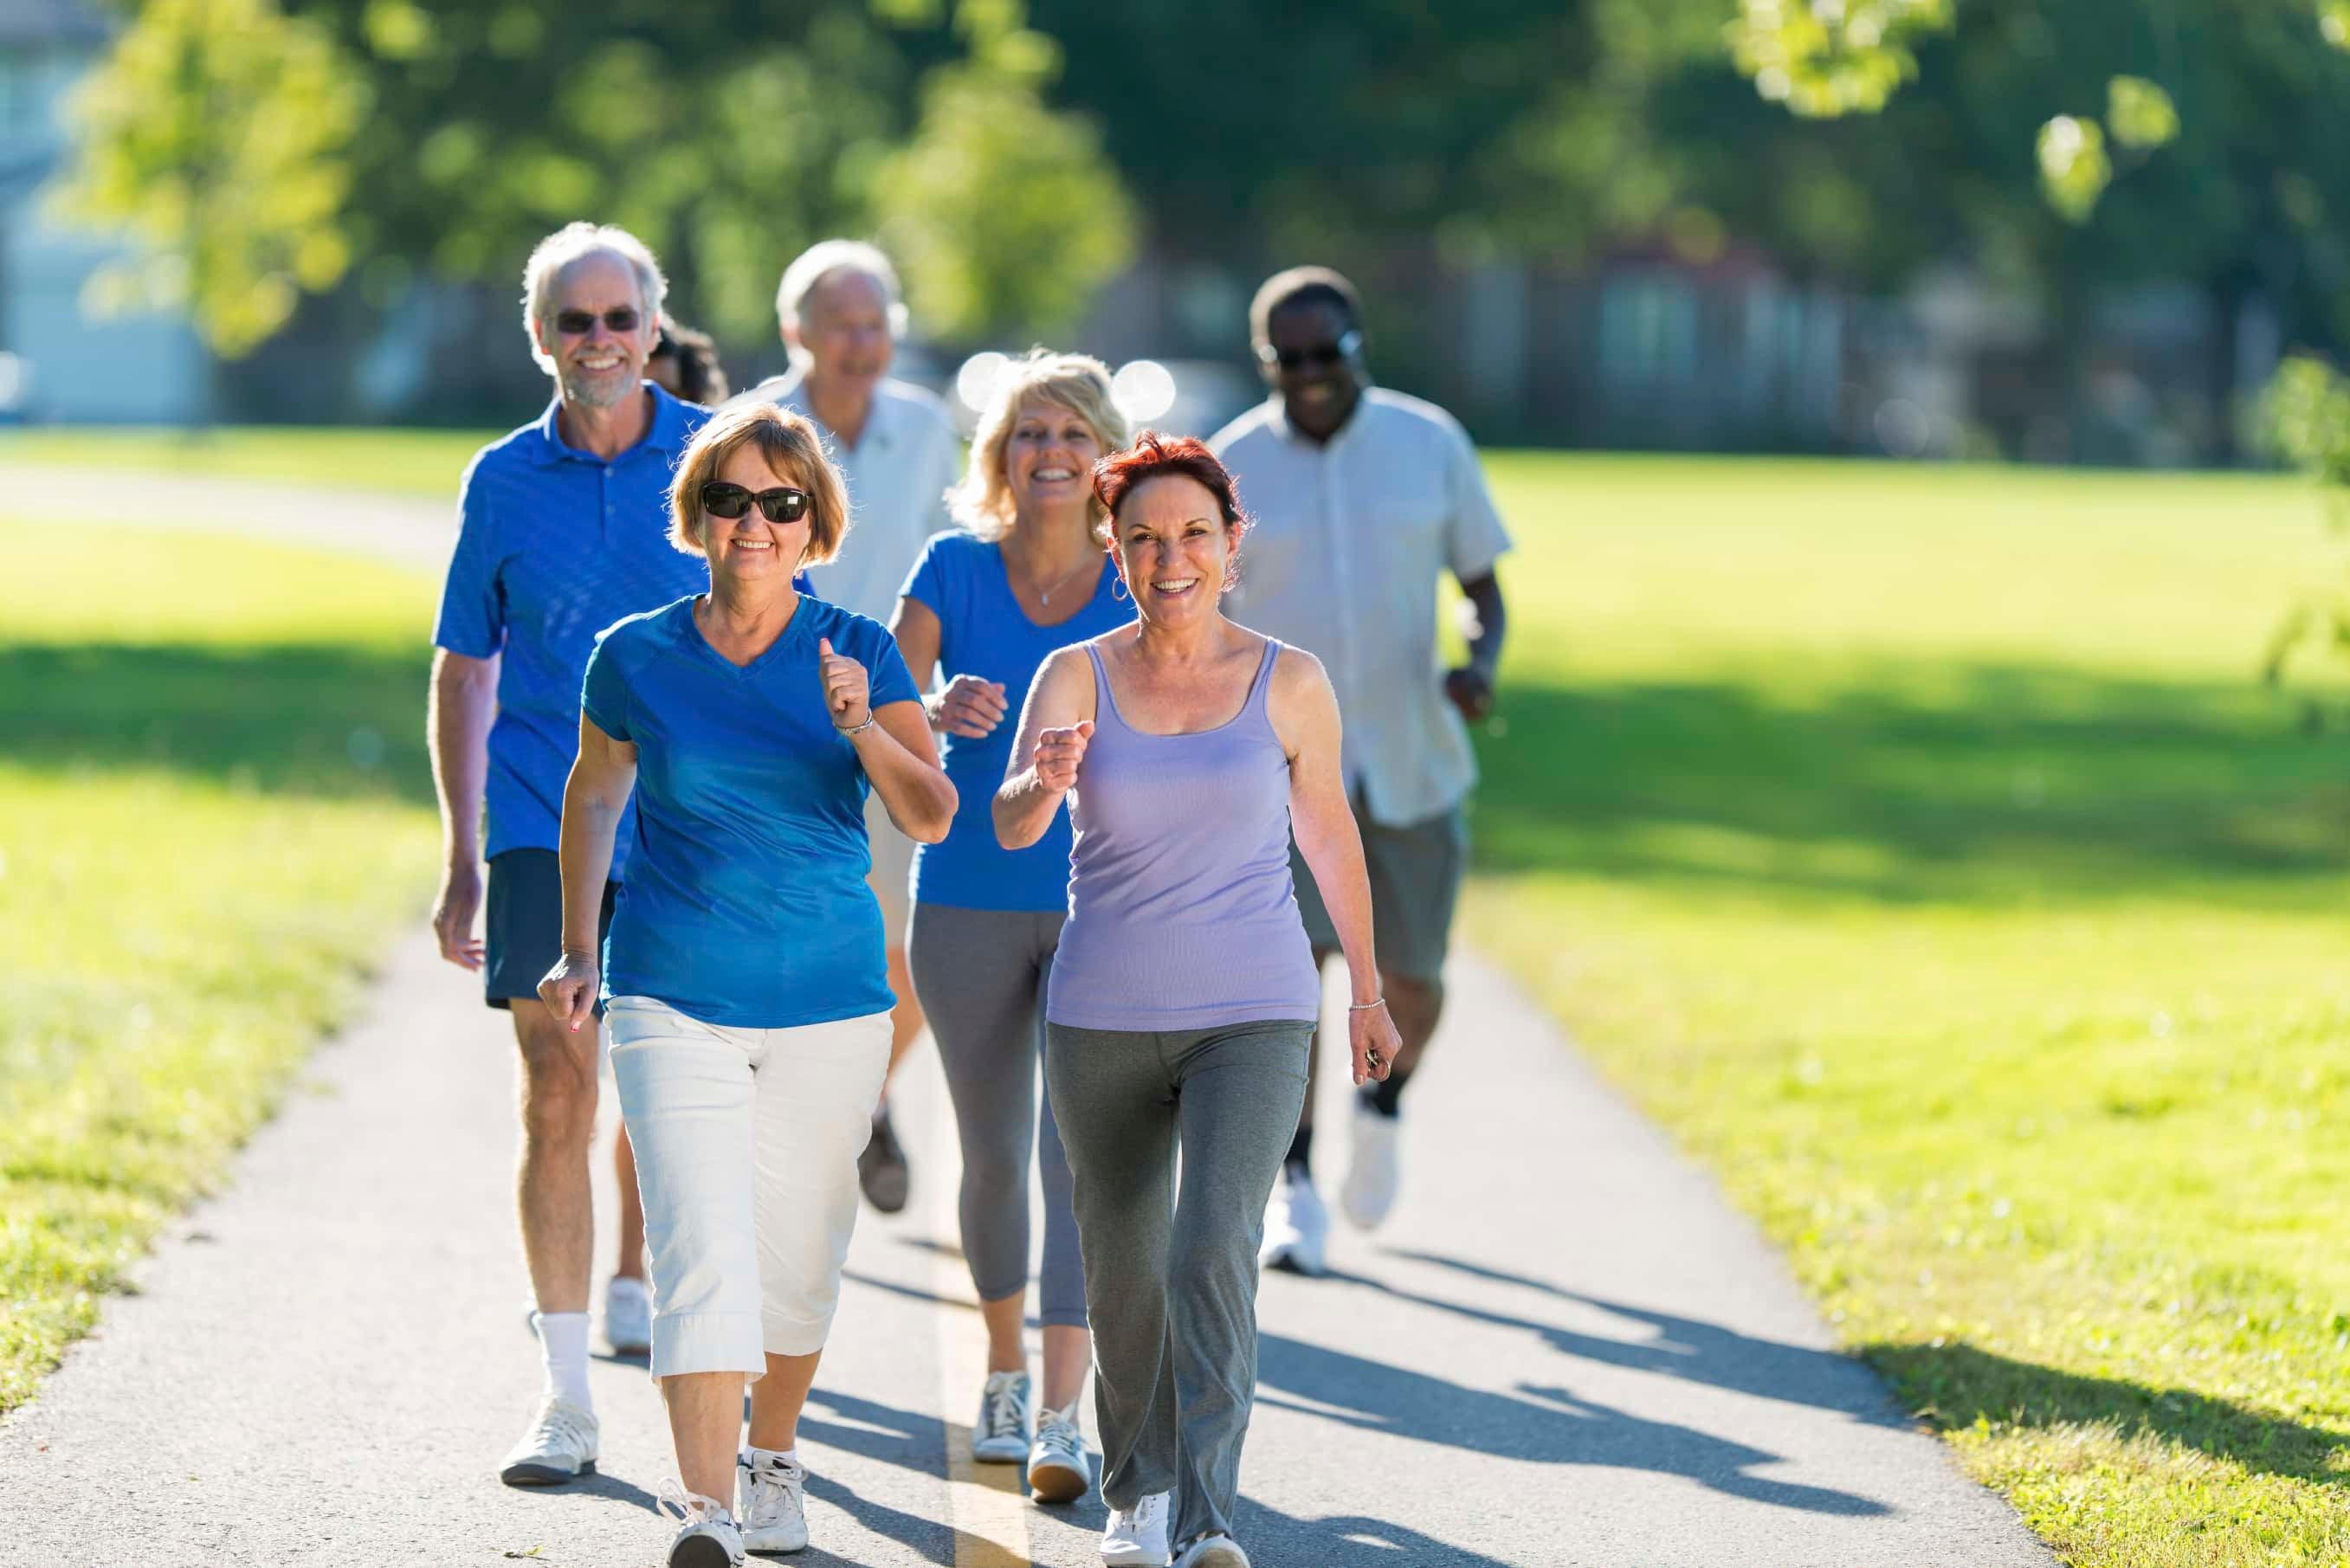 Healthy Active Seniors